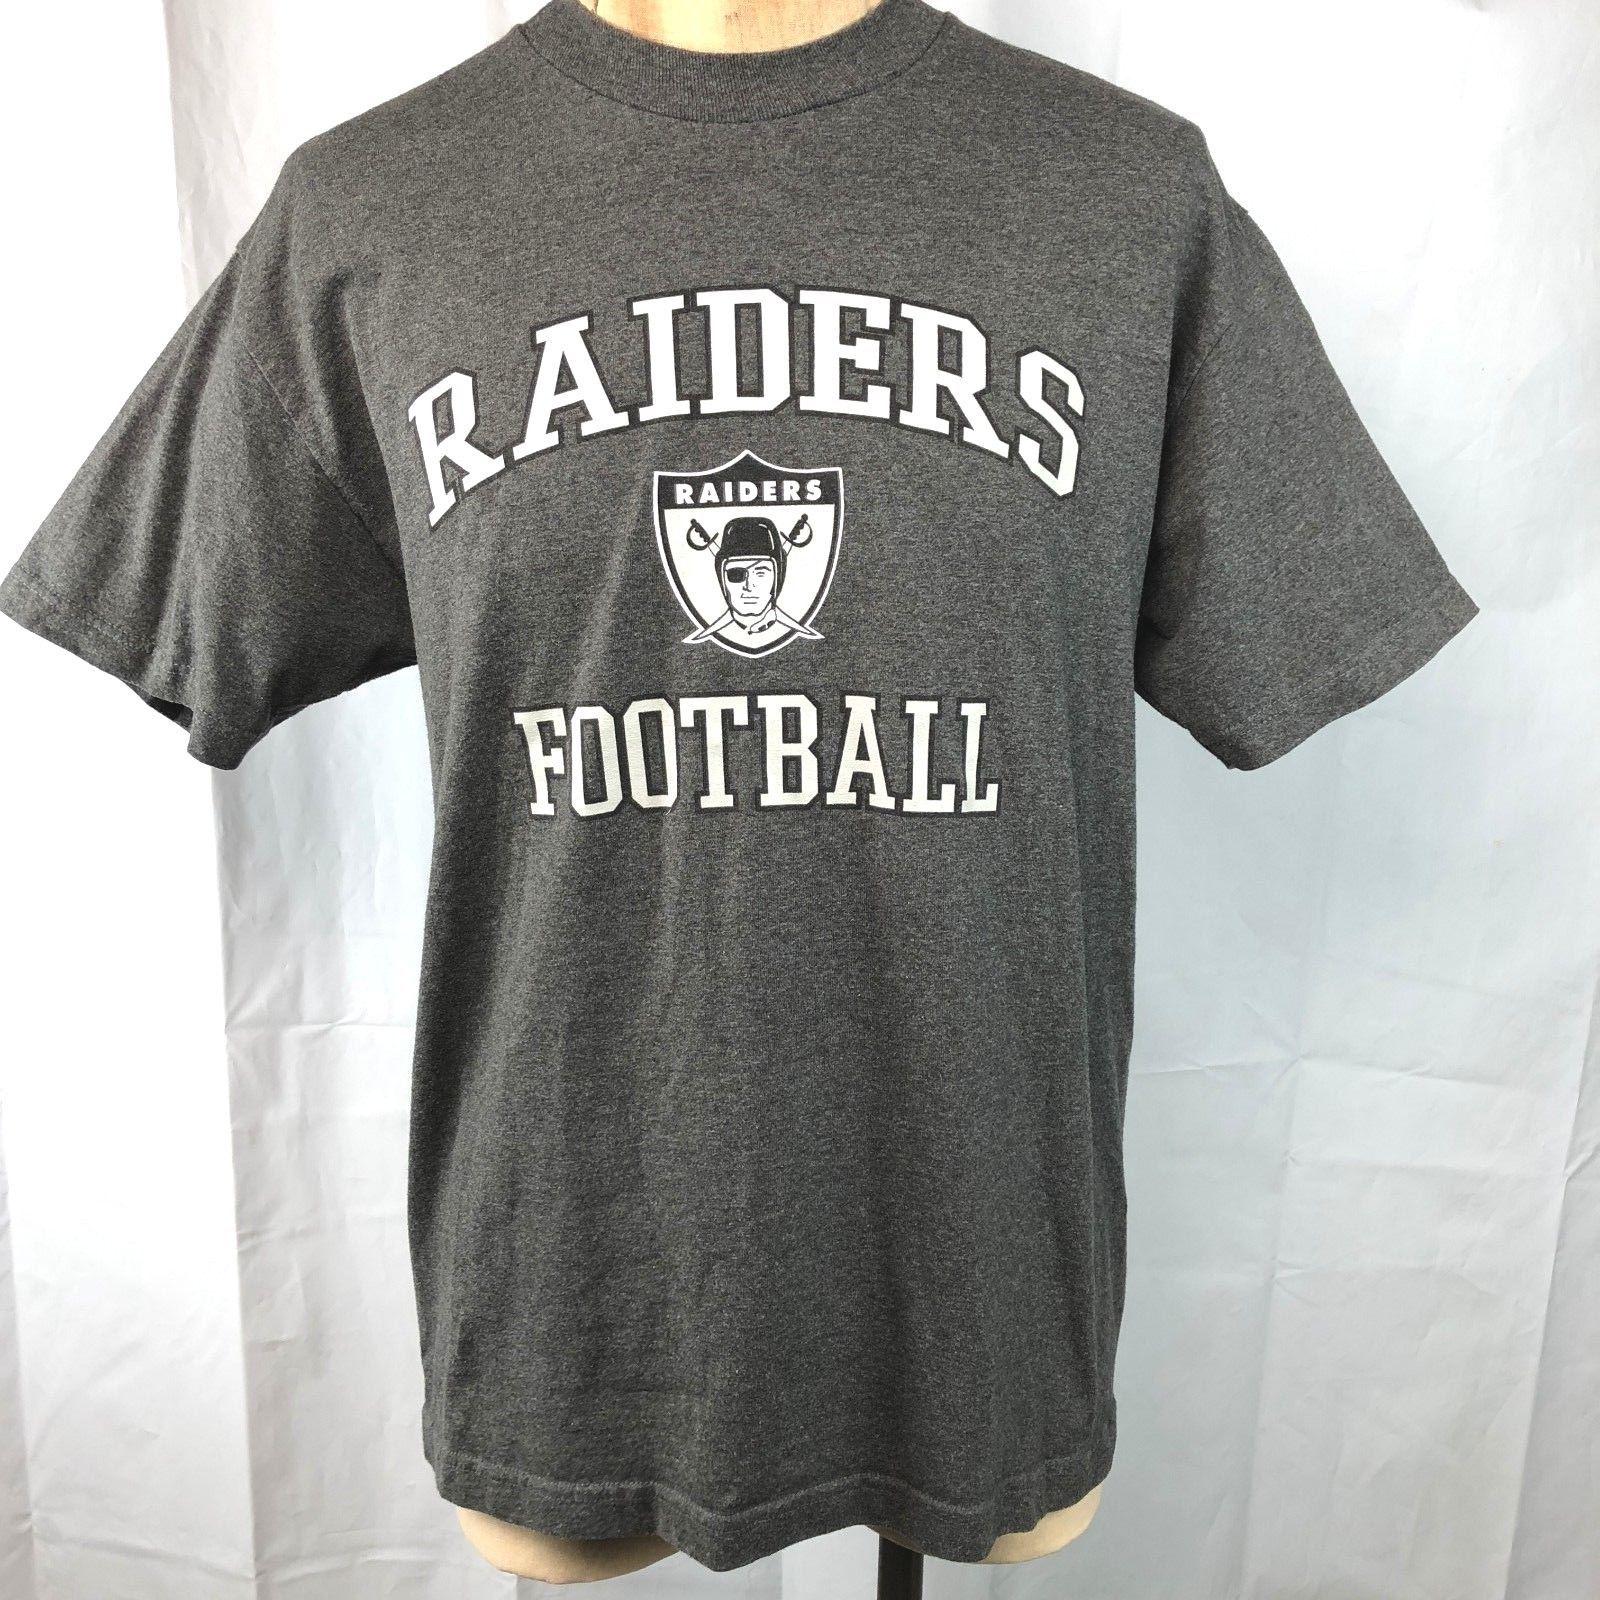 Raiders Football NFL Team Apparel L T-Shirt Large Mens Oakland or Los Angeles image 2